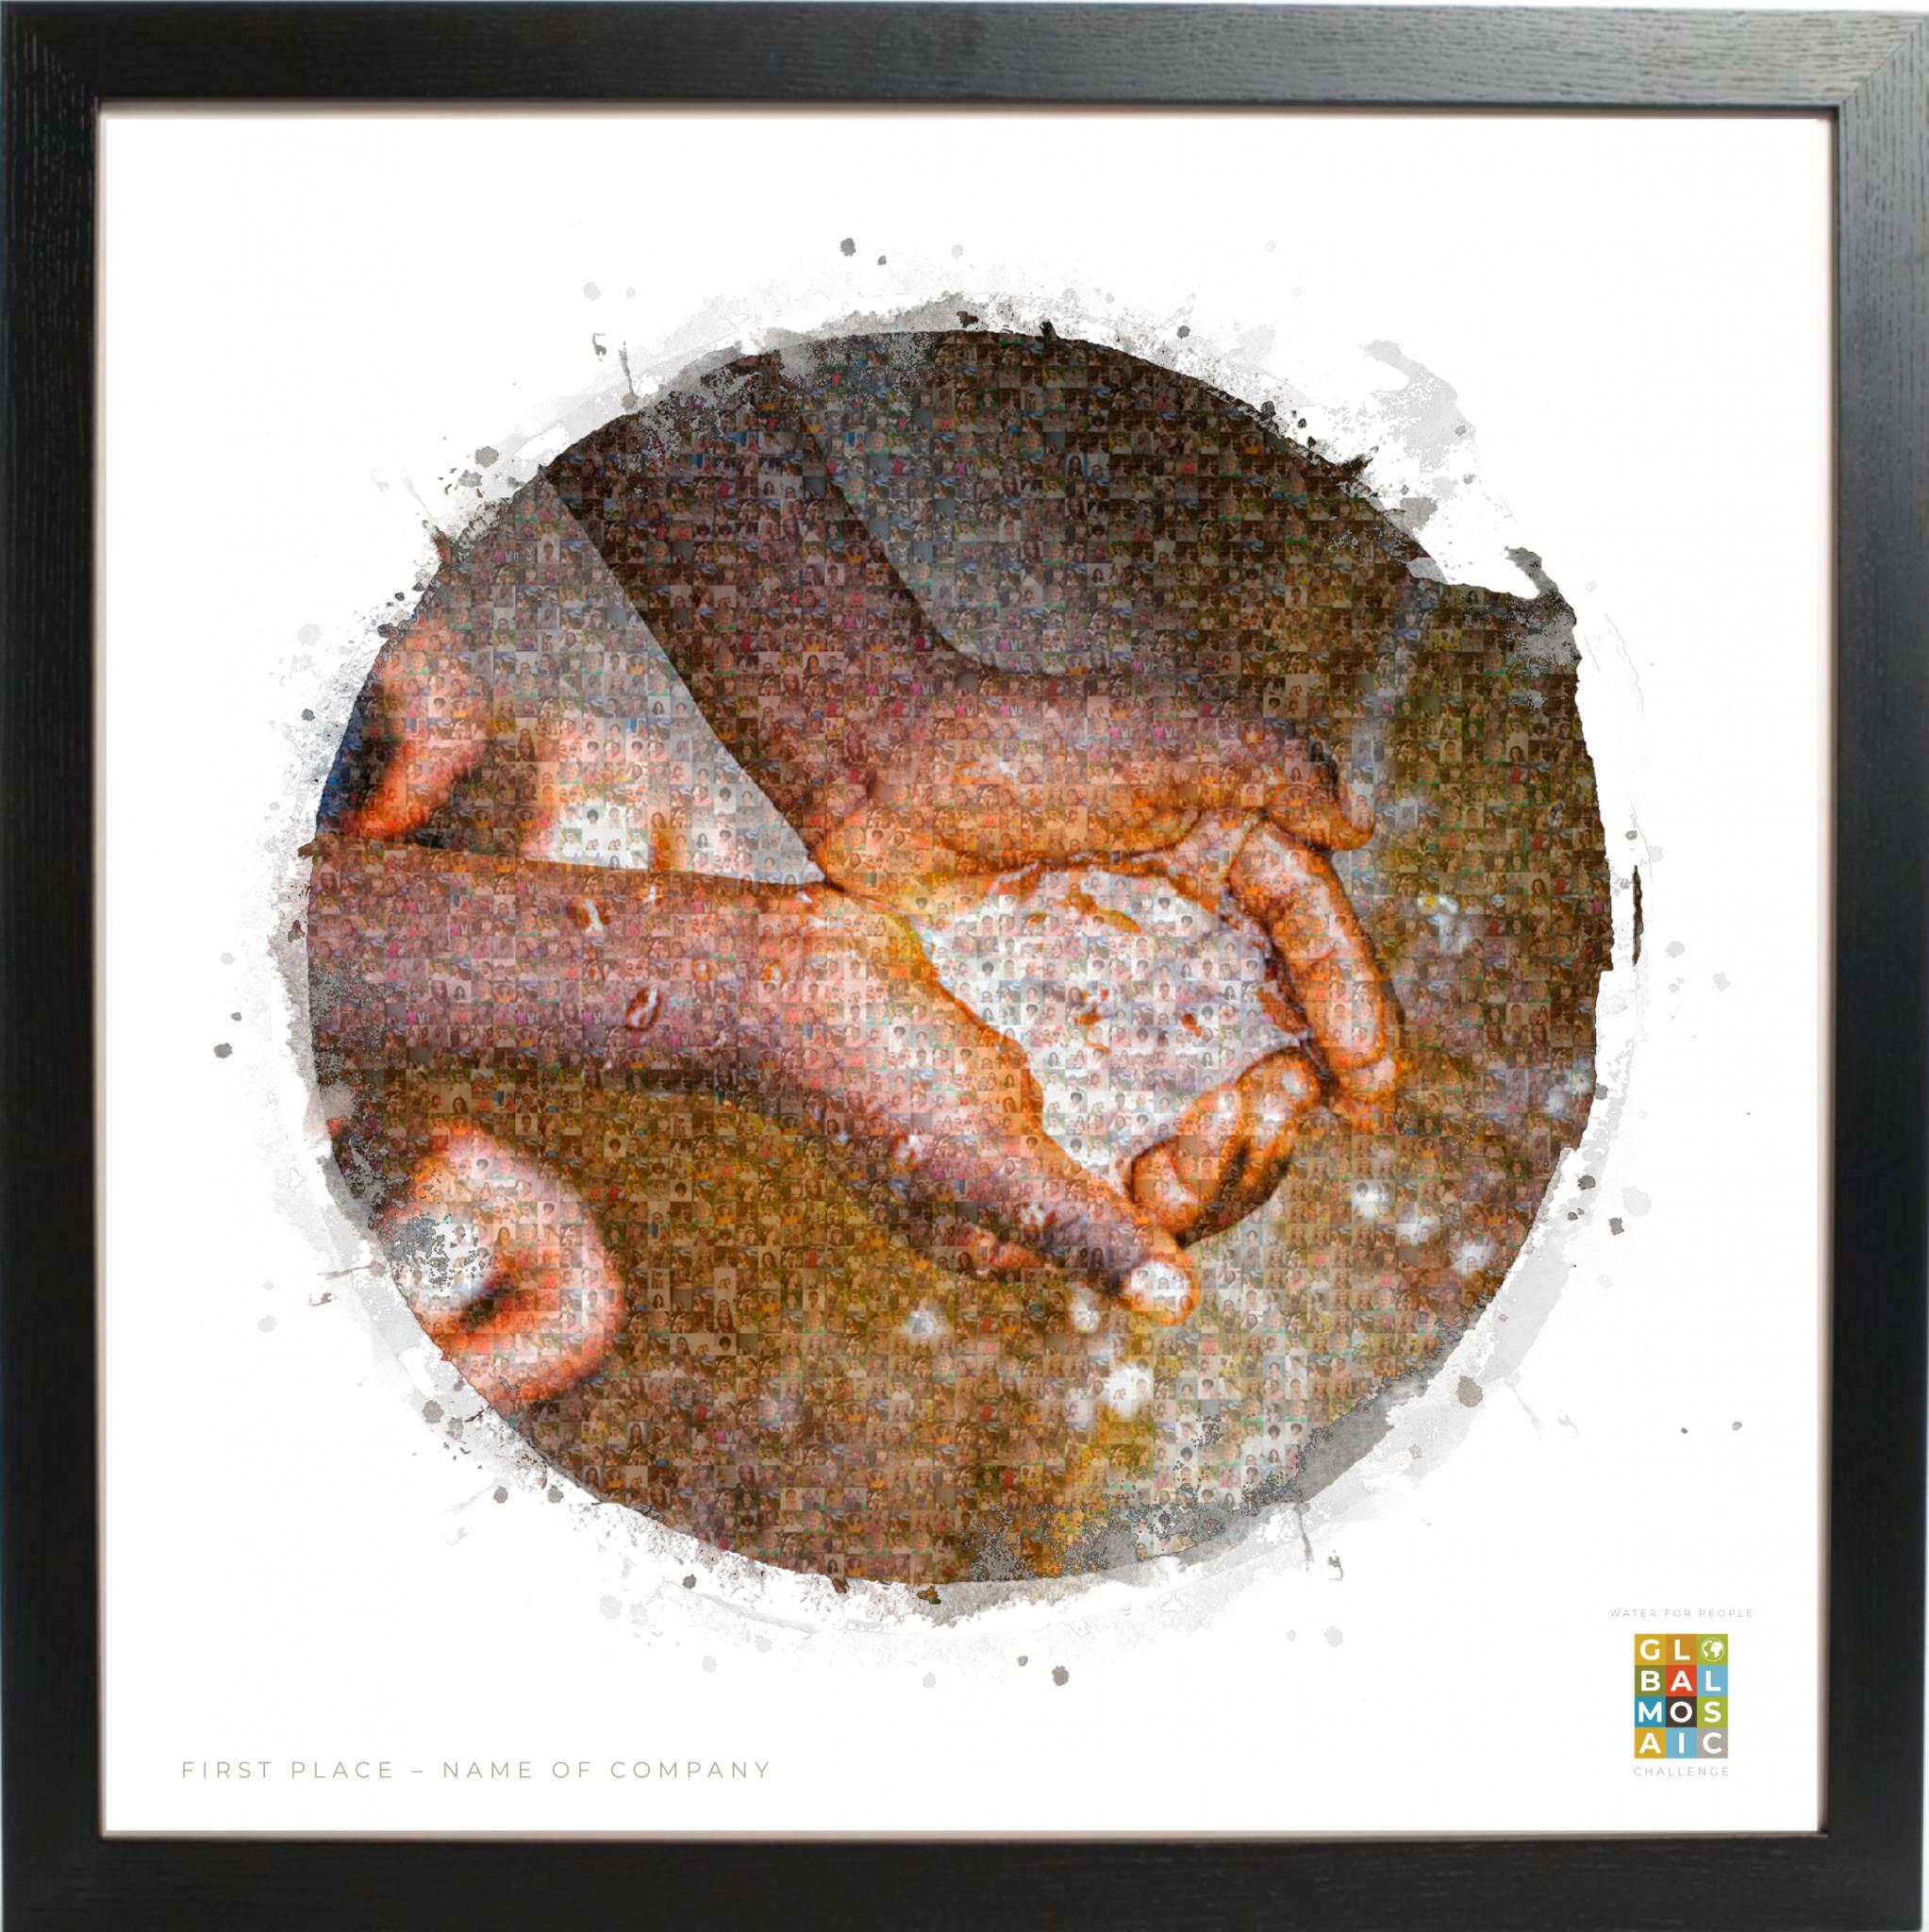 Mosaic_frame-large